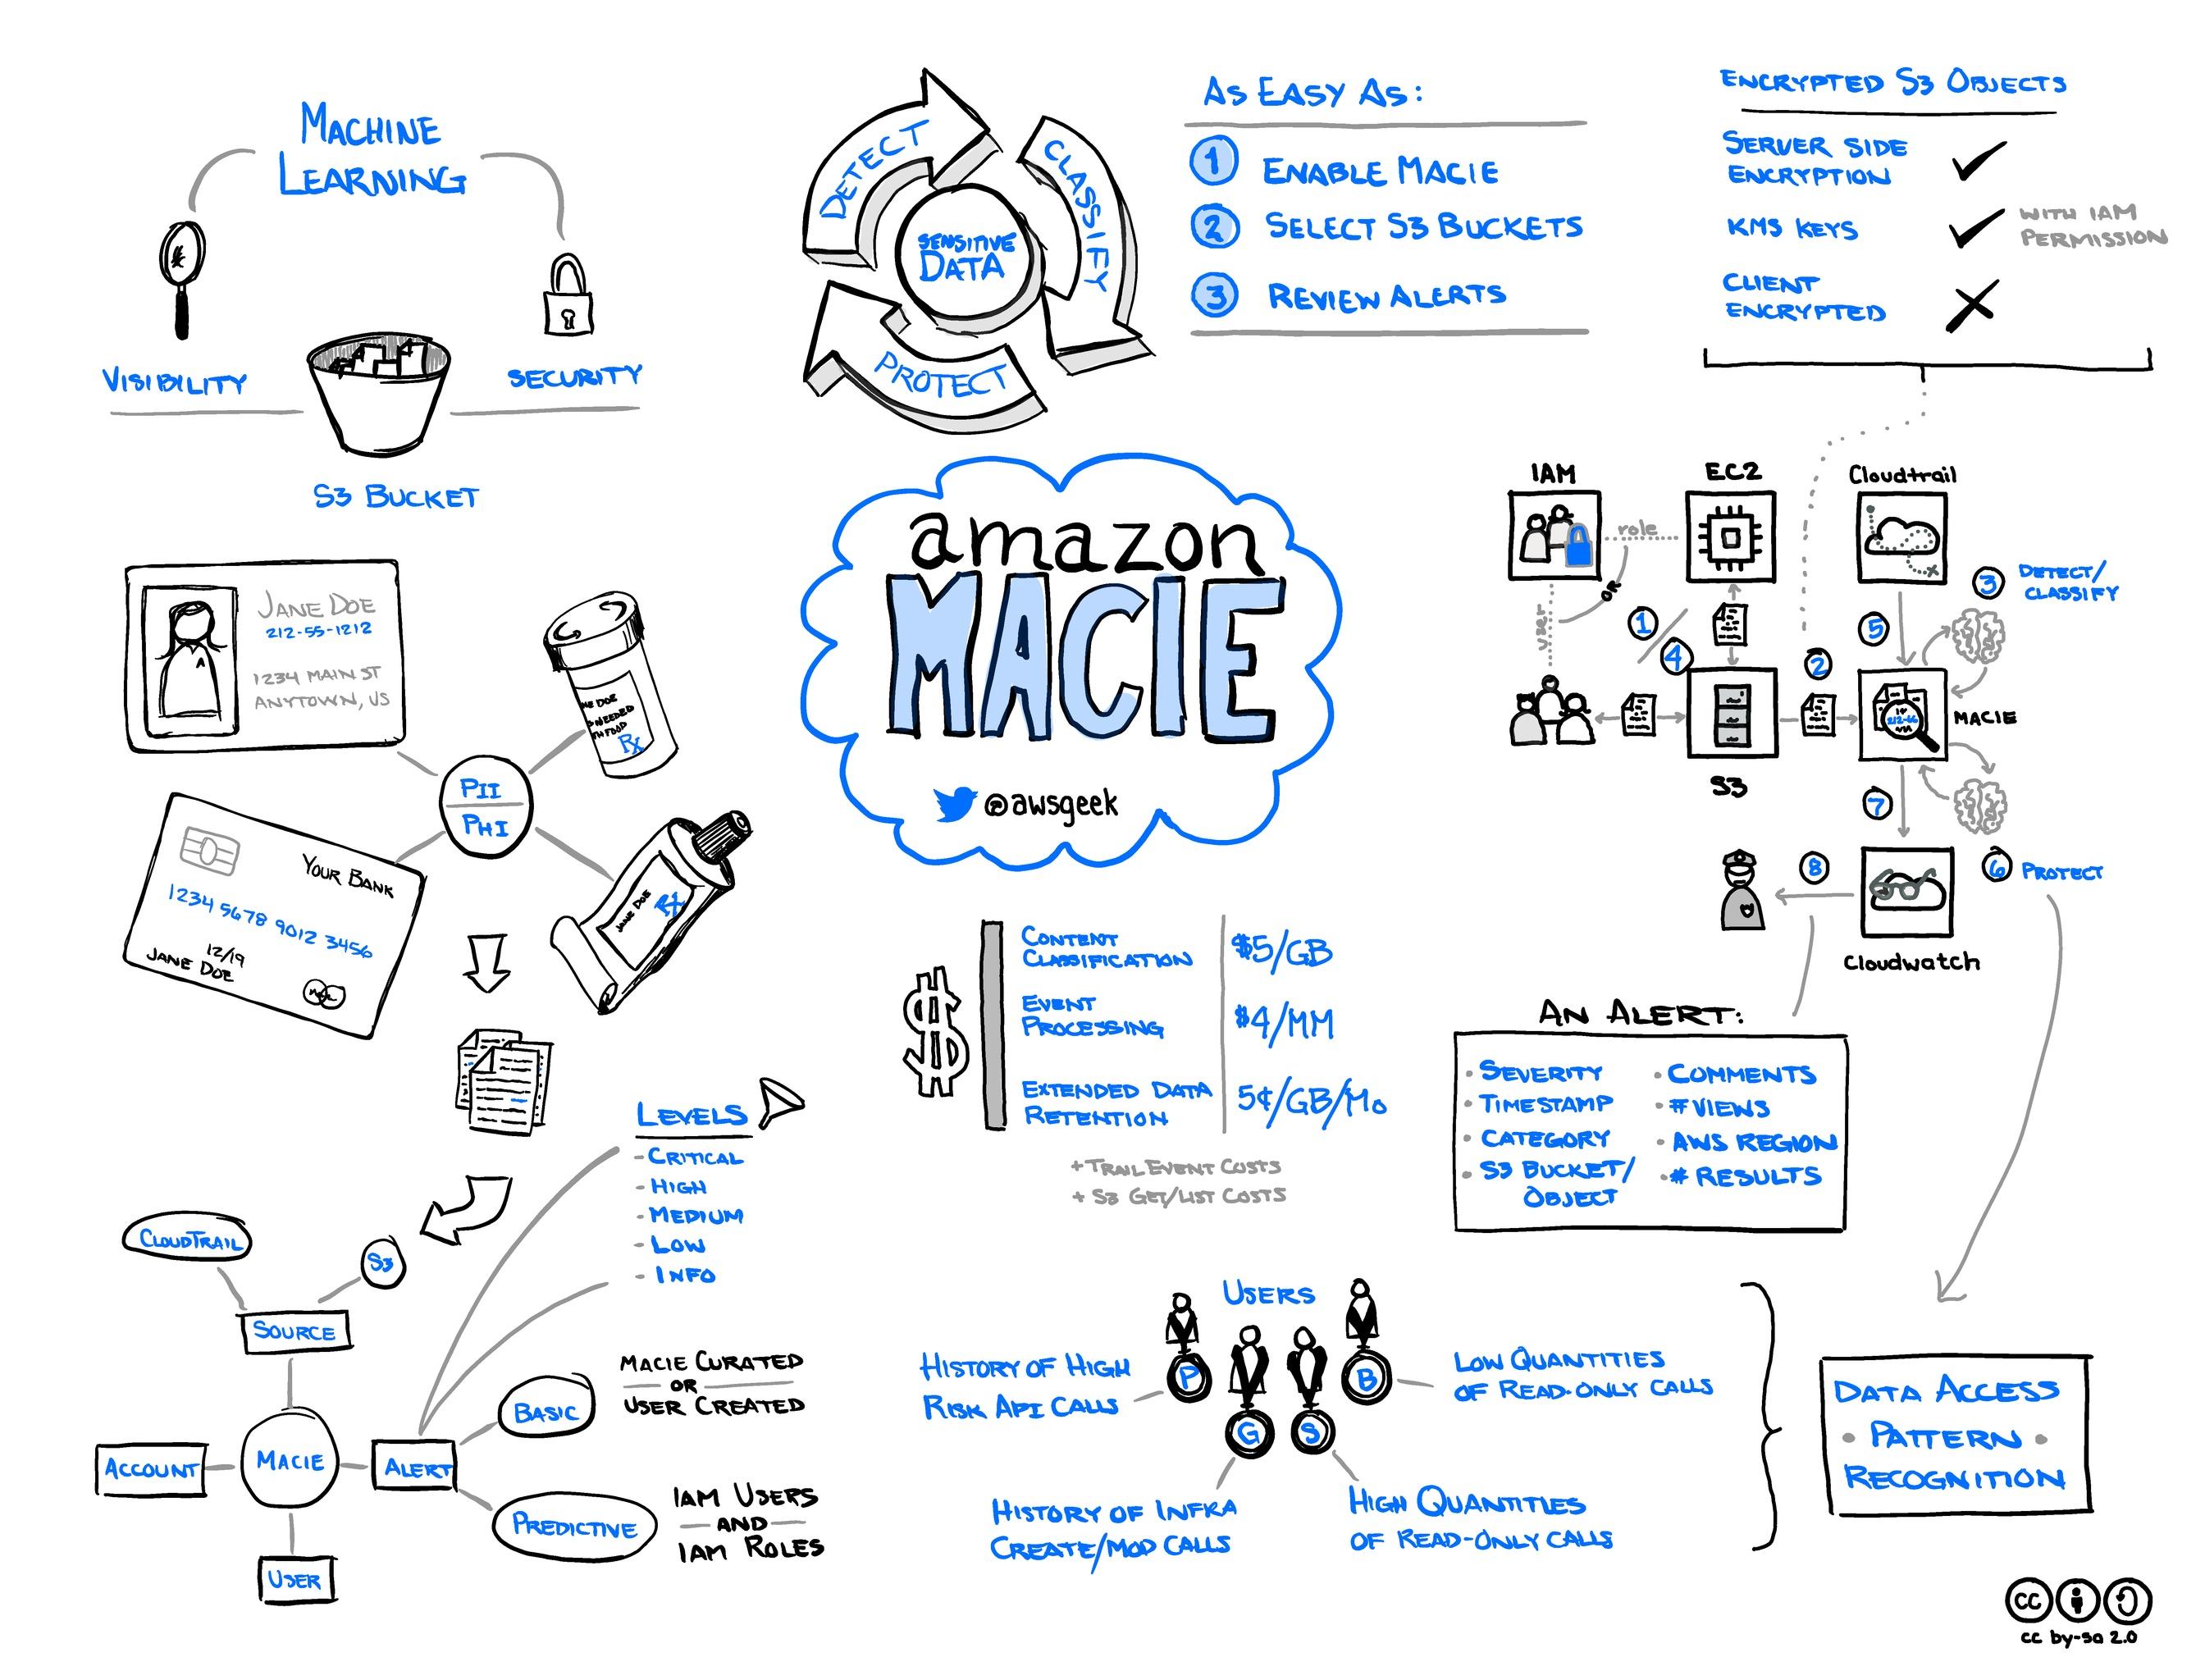 Amazon-Macie.jpg